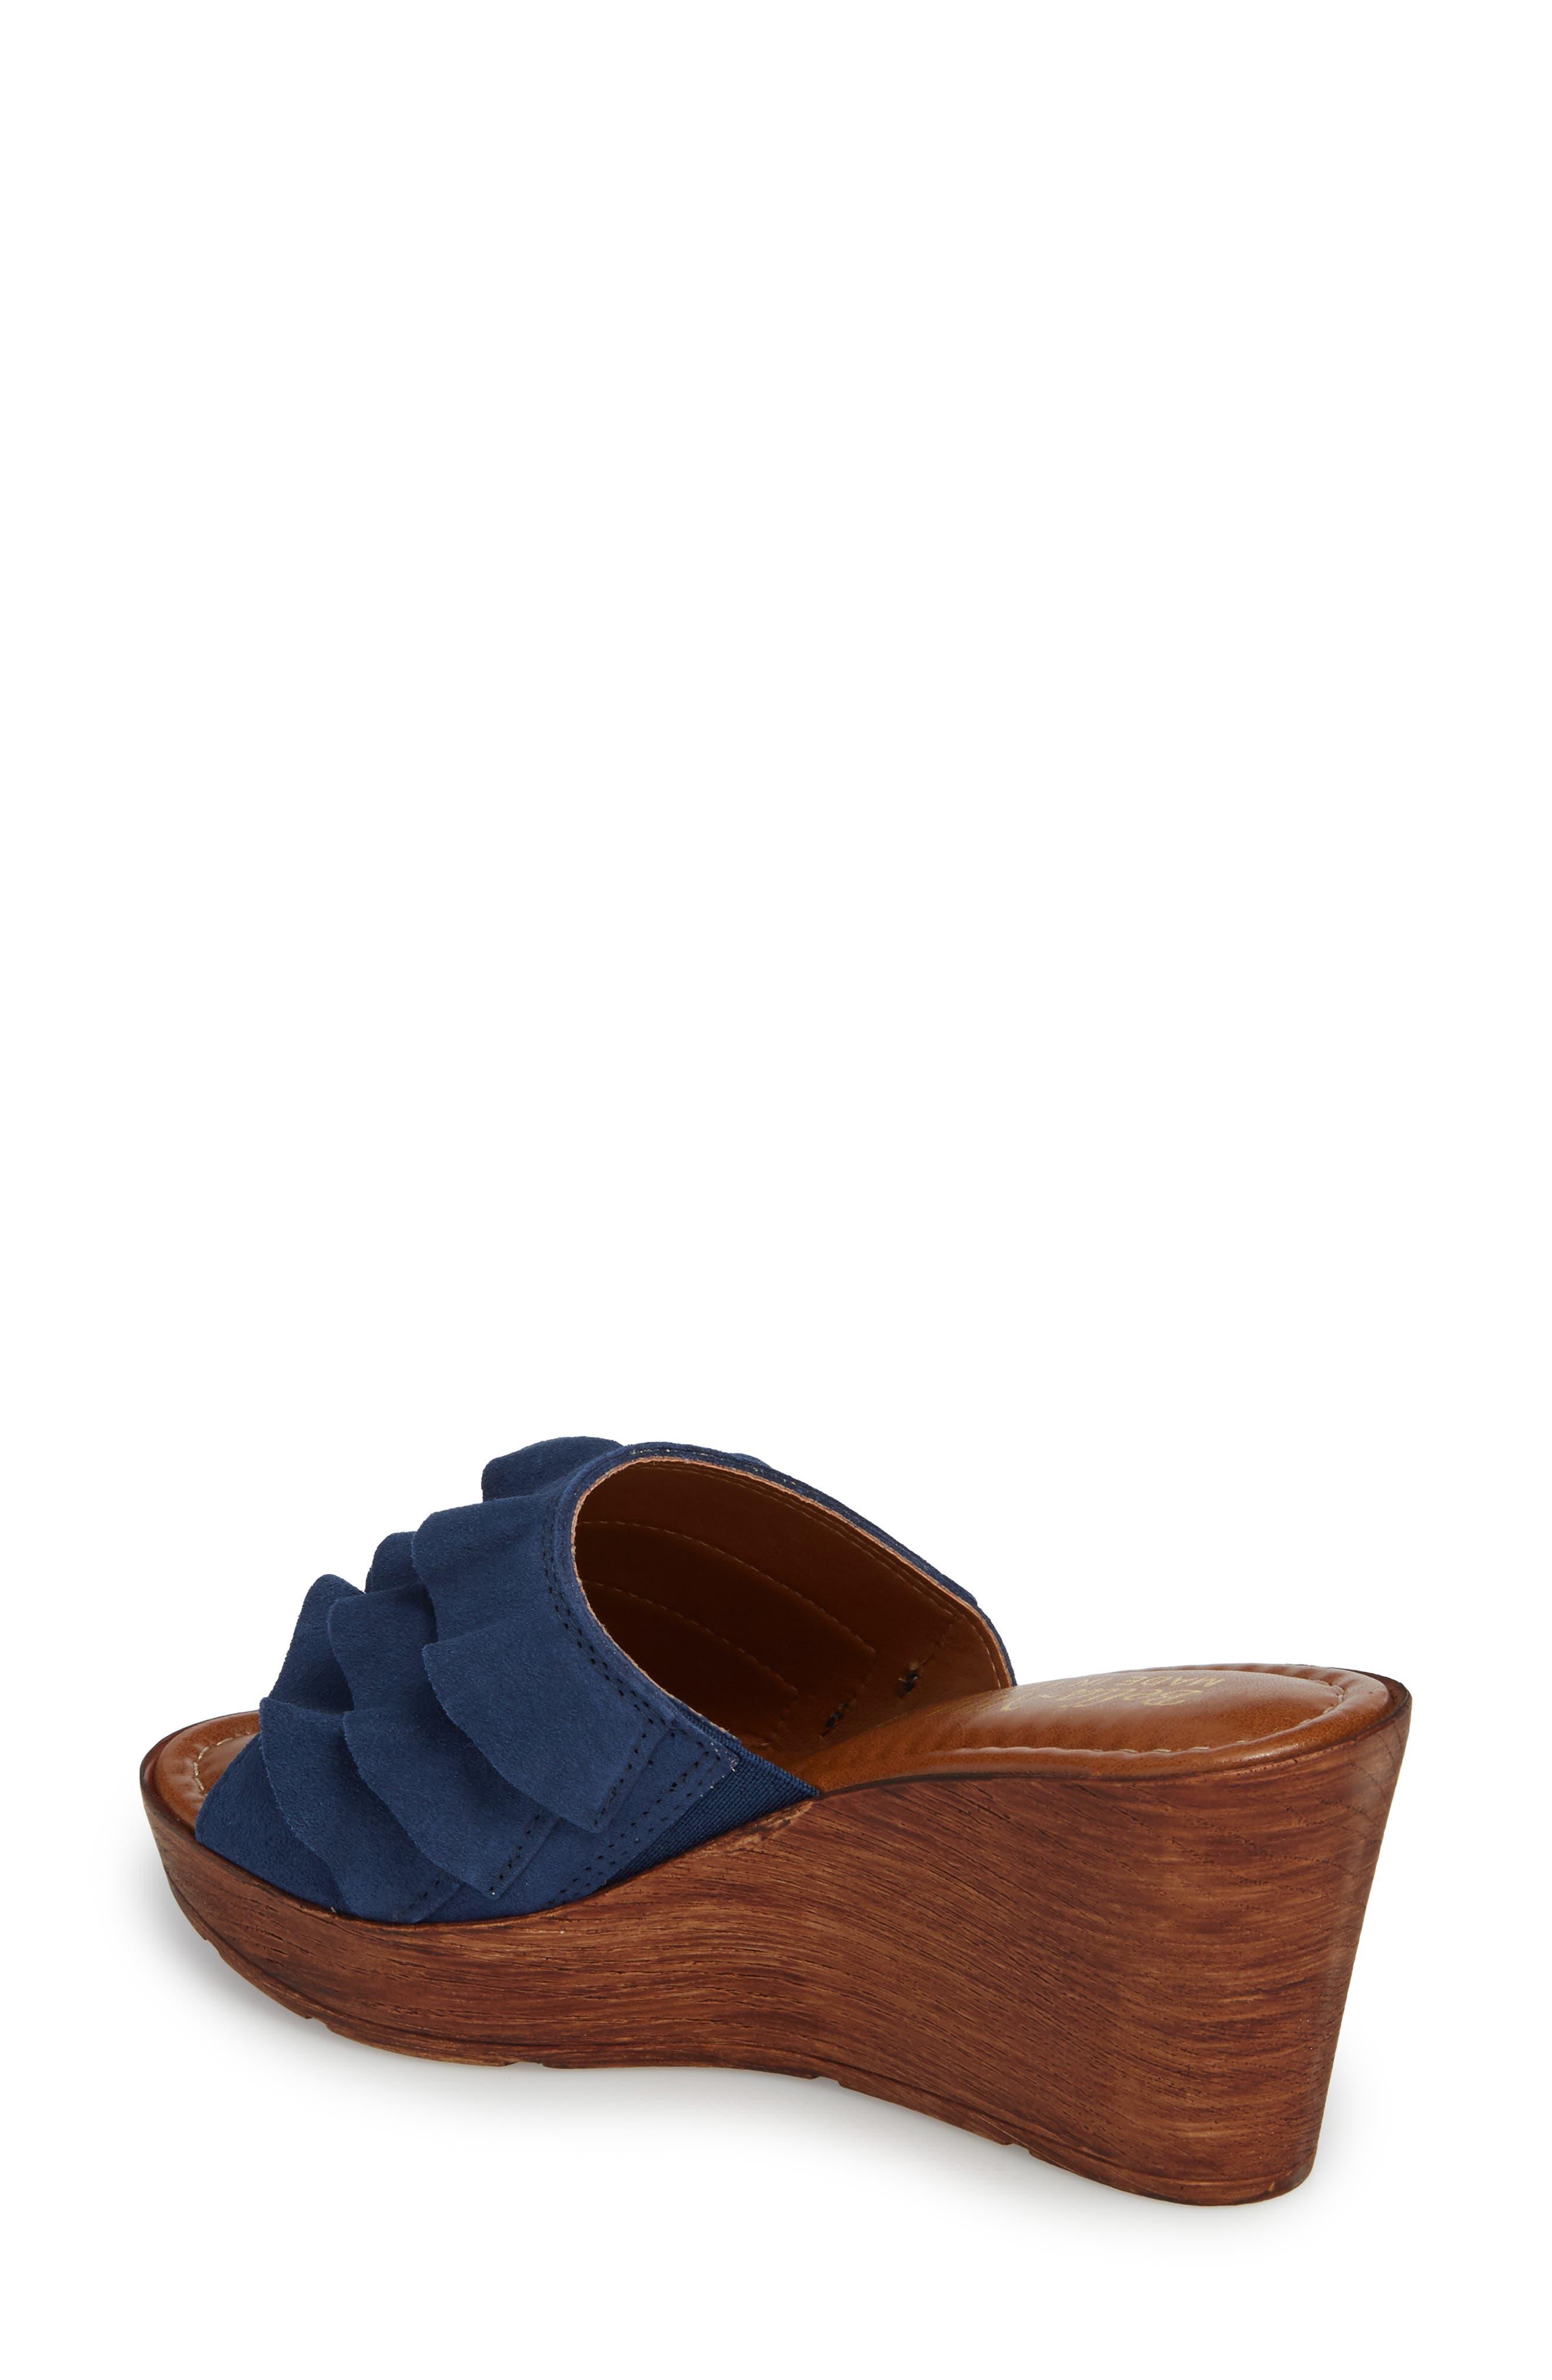 Bey Platform Wedge Sandal,                             Alternate thumbnail 2, color,                             NAVY SUEDE